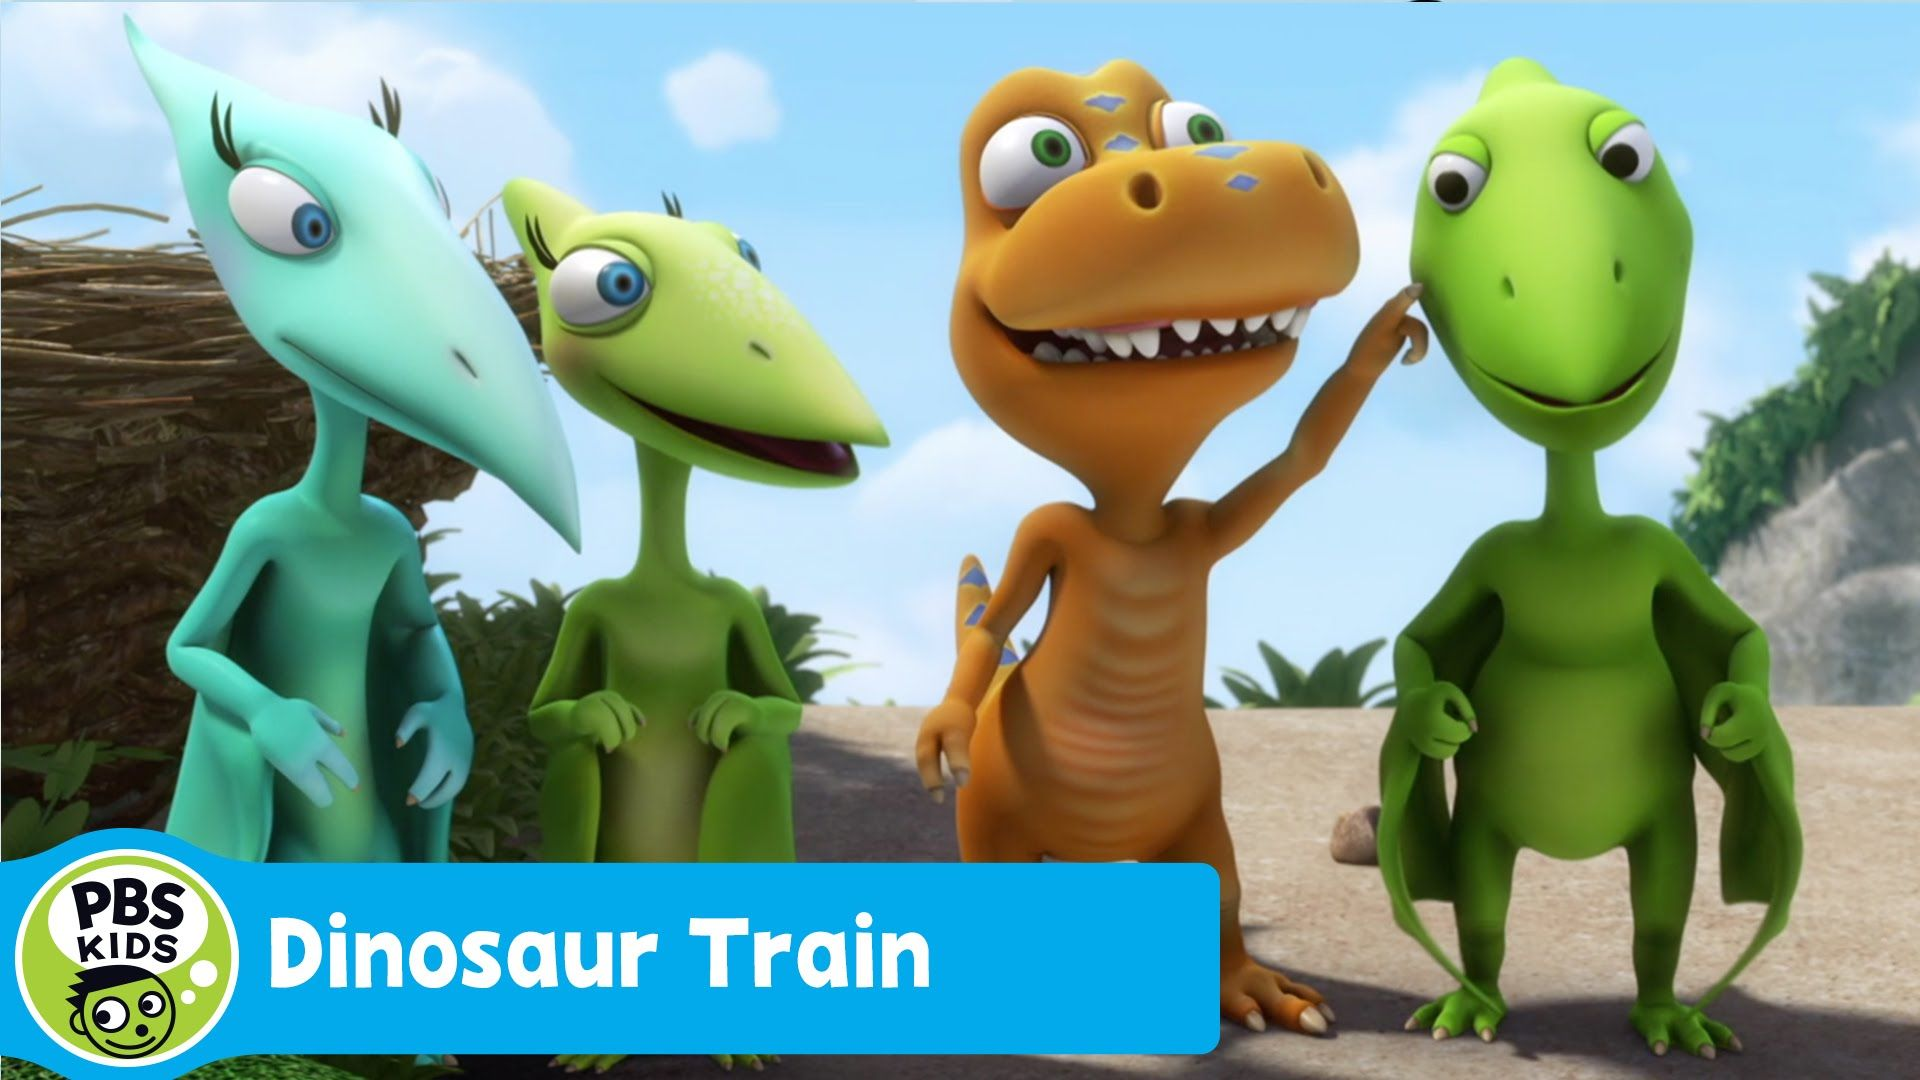 DINOSAUR TRAIN Talking Clouds PBS KIDS Dinosaur